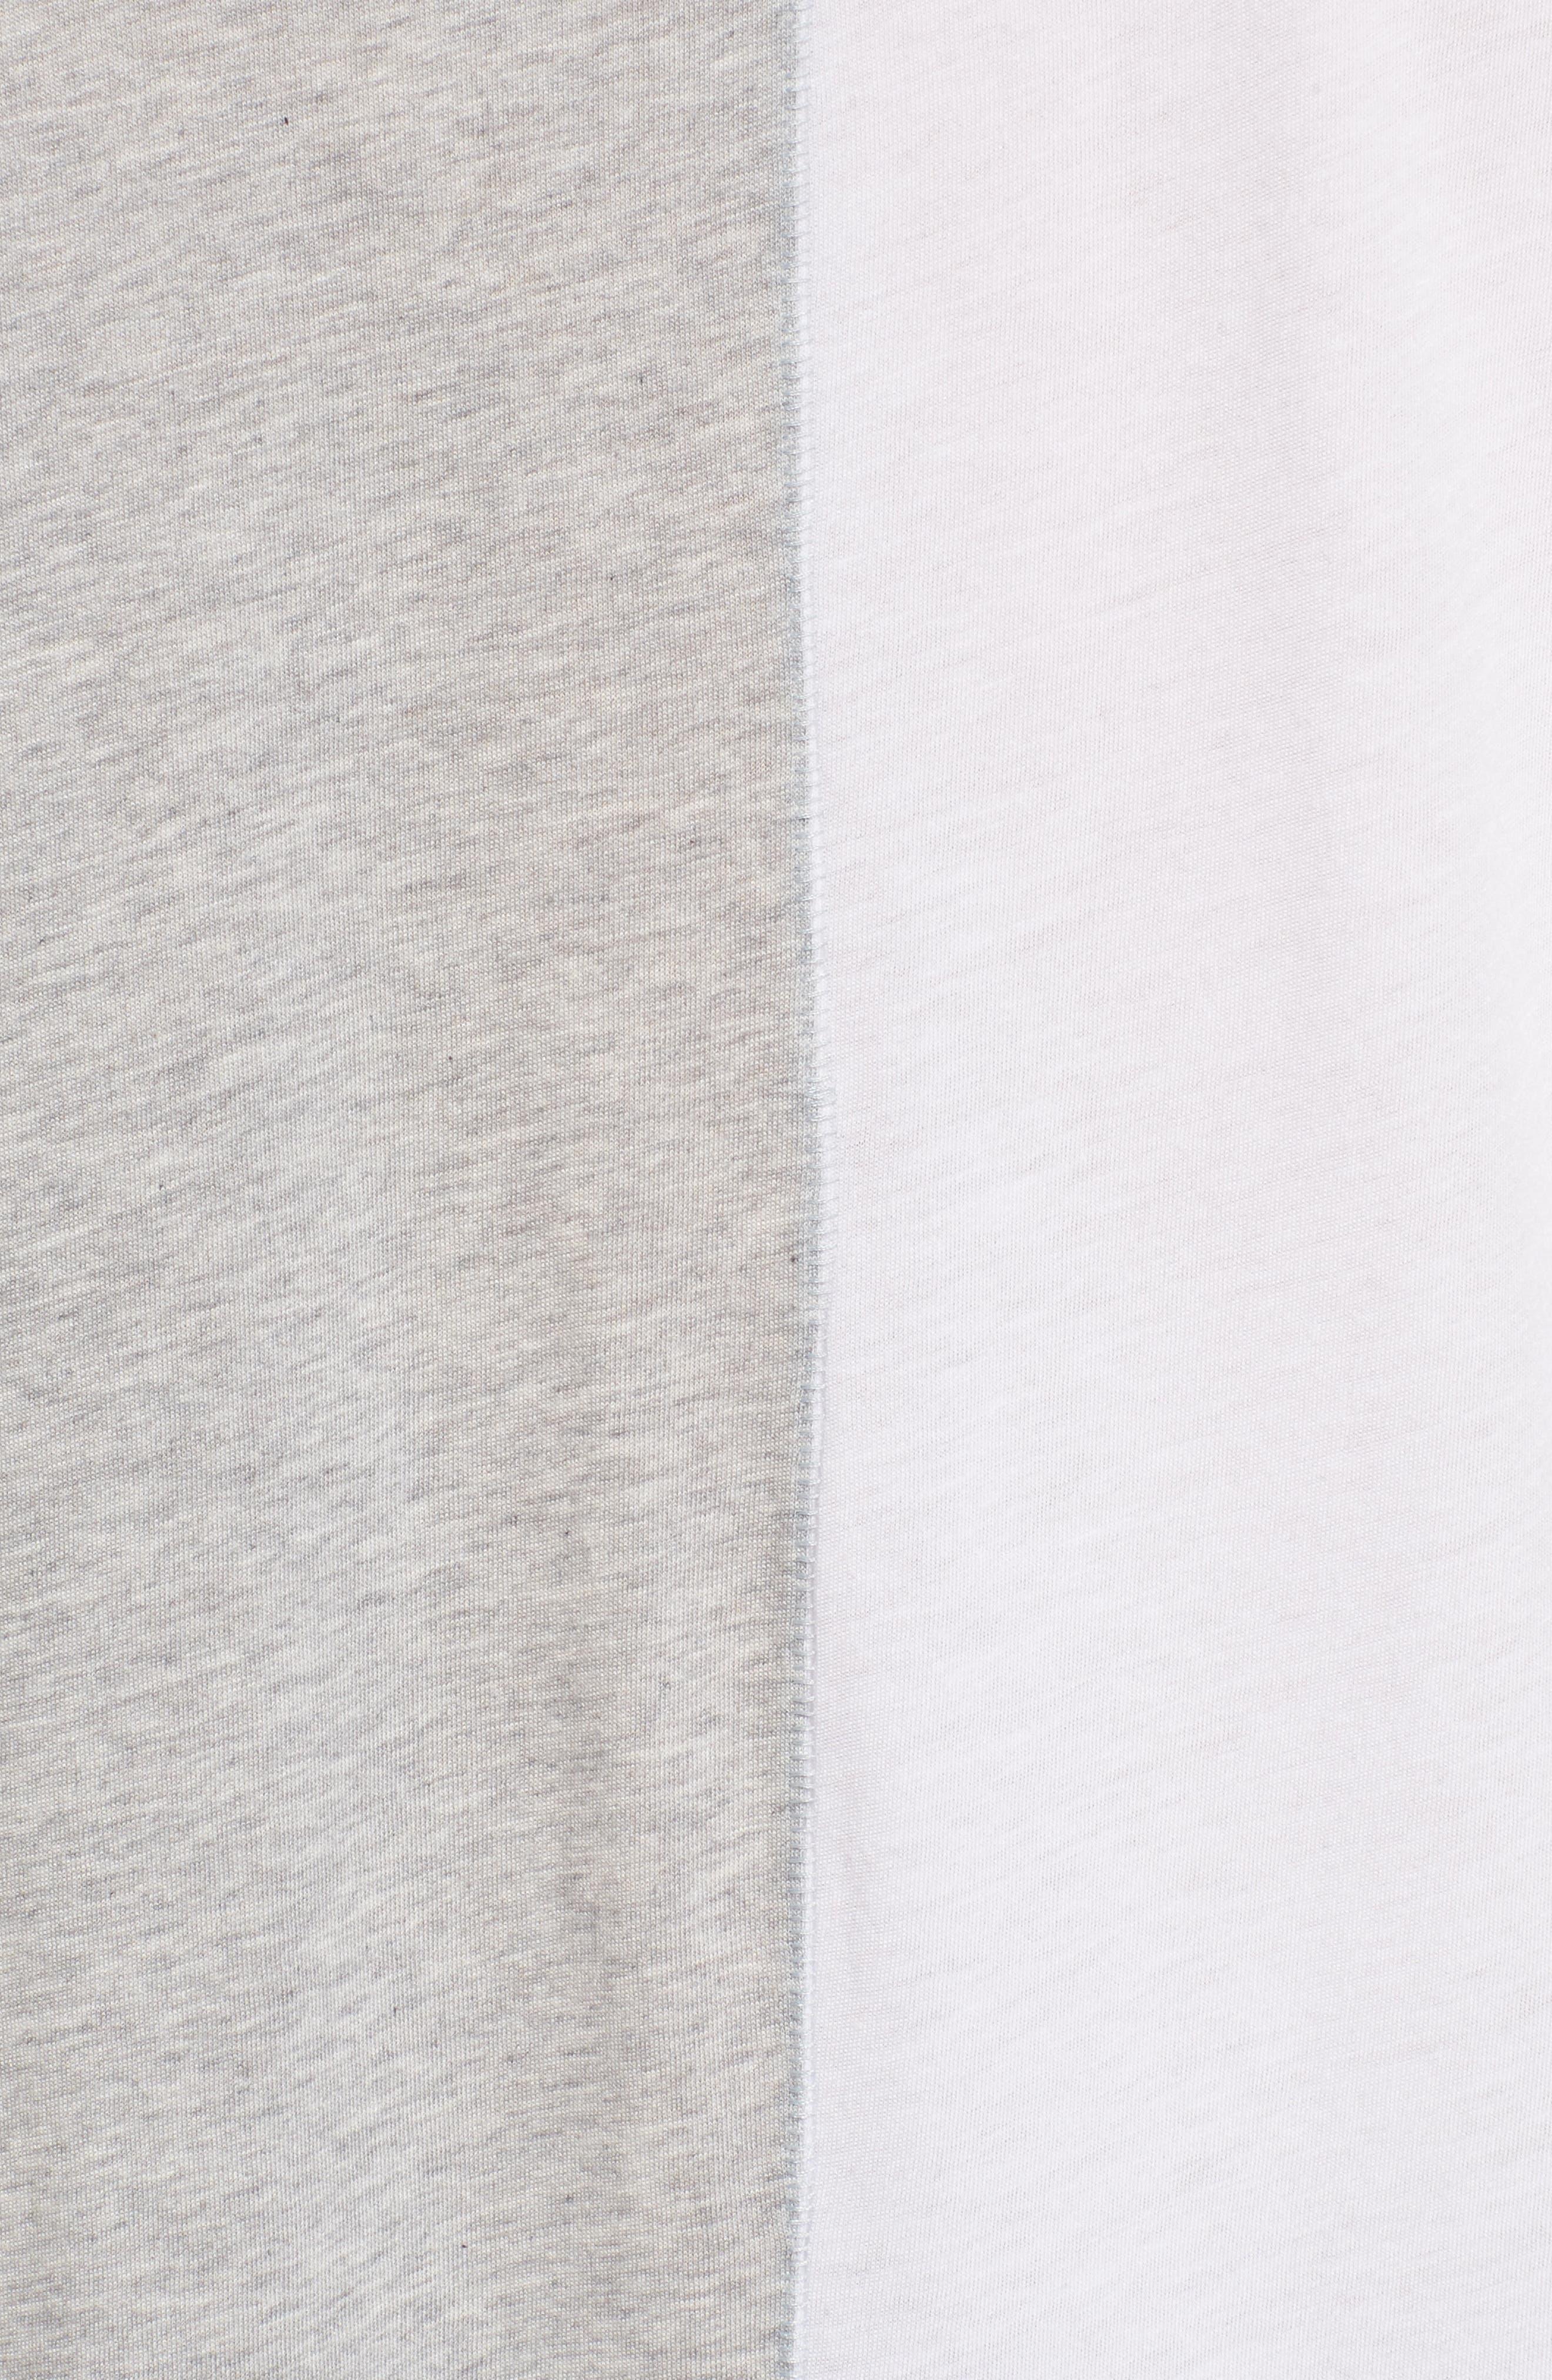 Boxy Splice T-Shirt,                             Alternate thumbnail 5, color,                             White/ Grey Heather